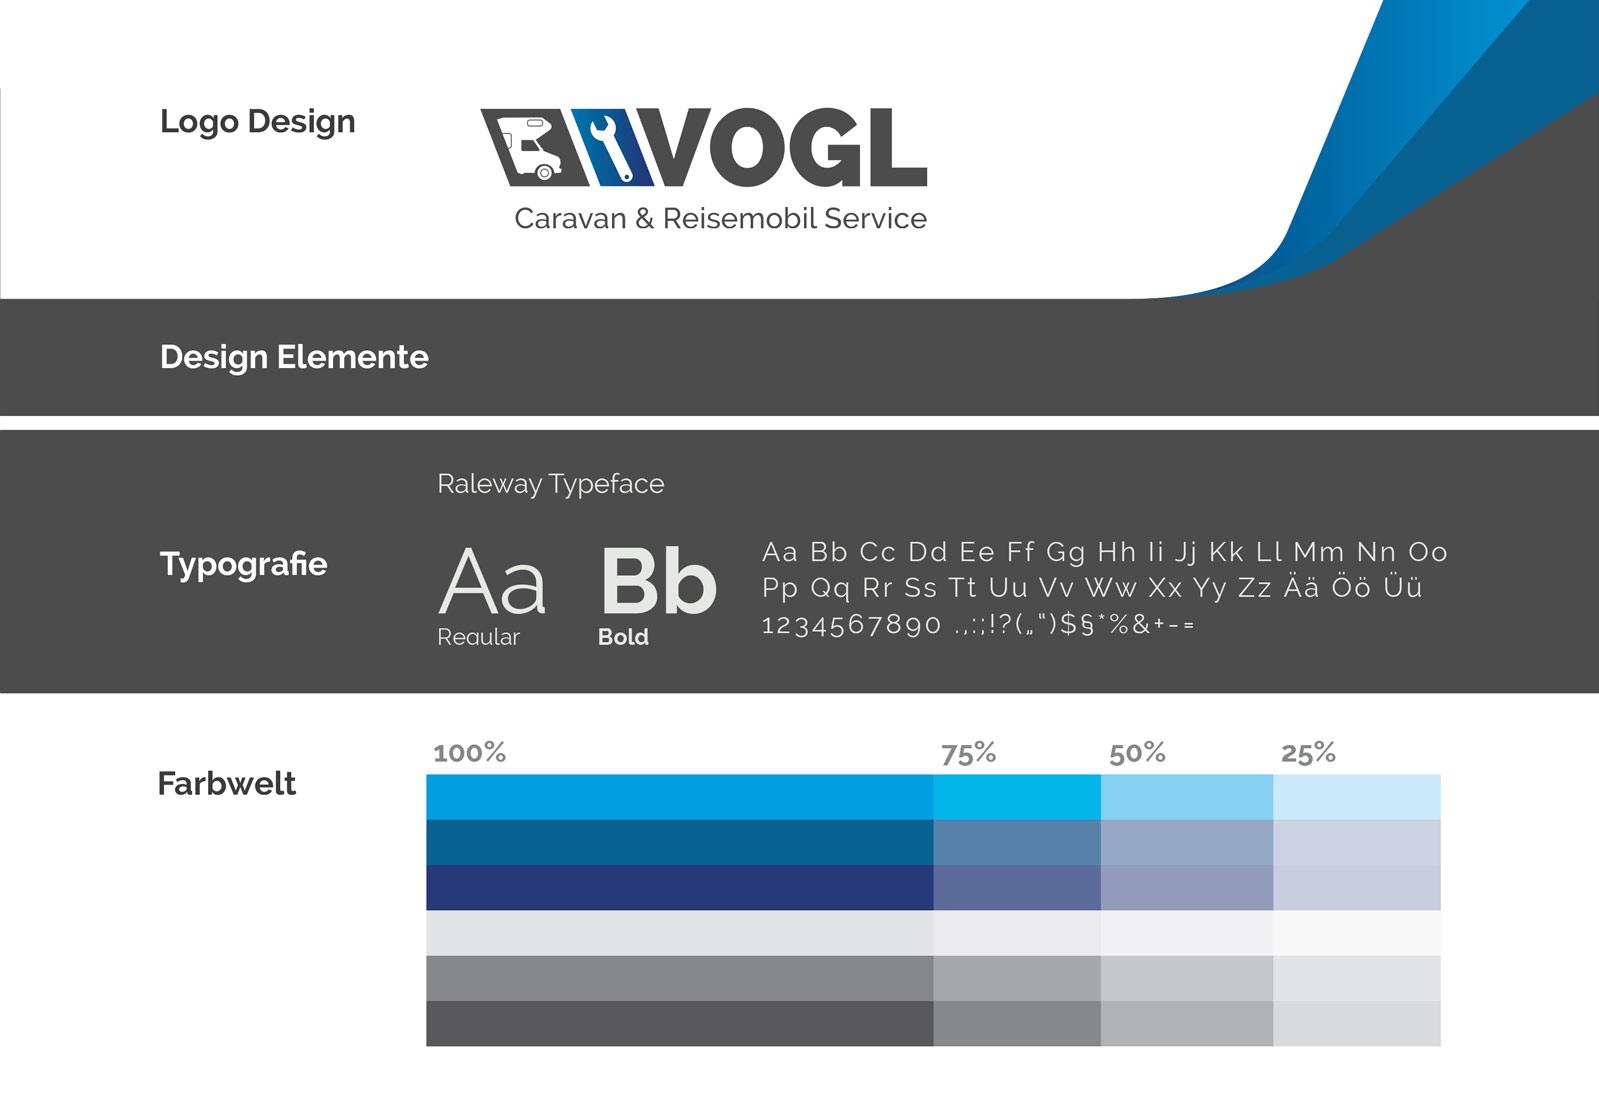 Vogl_Corporate_Design_Logo_Design_3.jpg